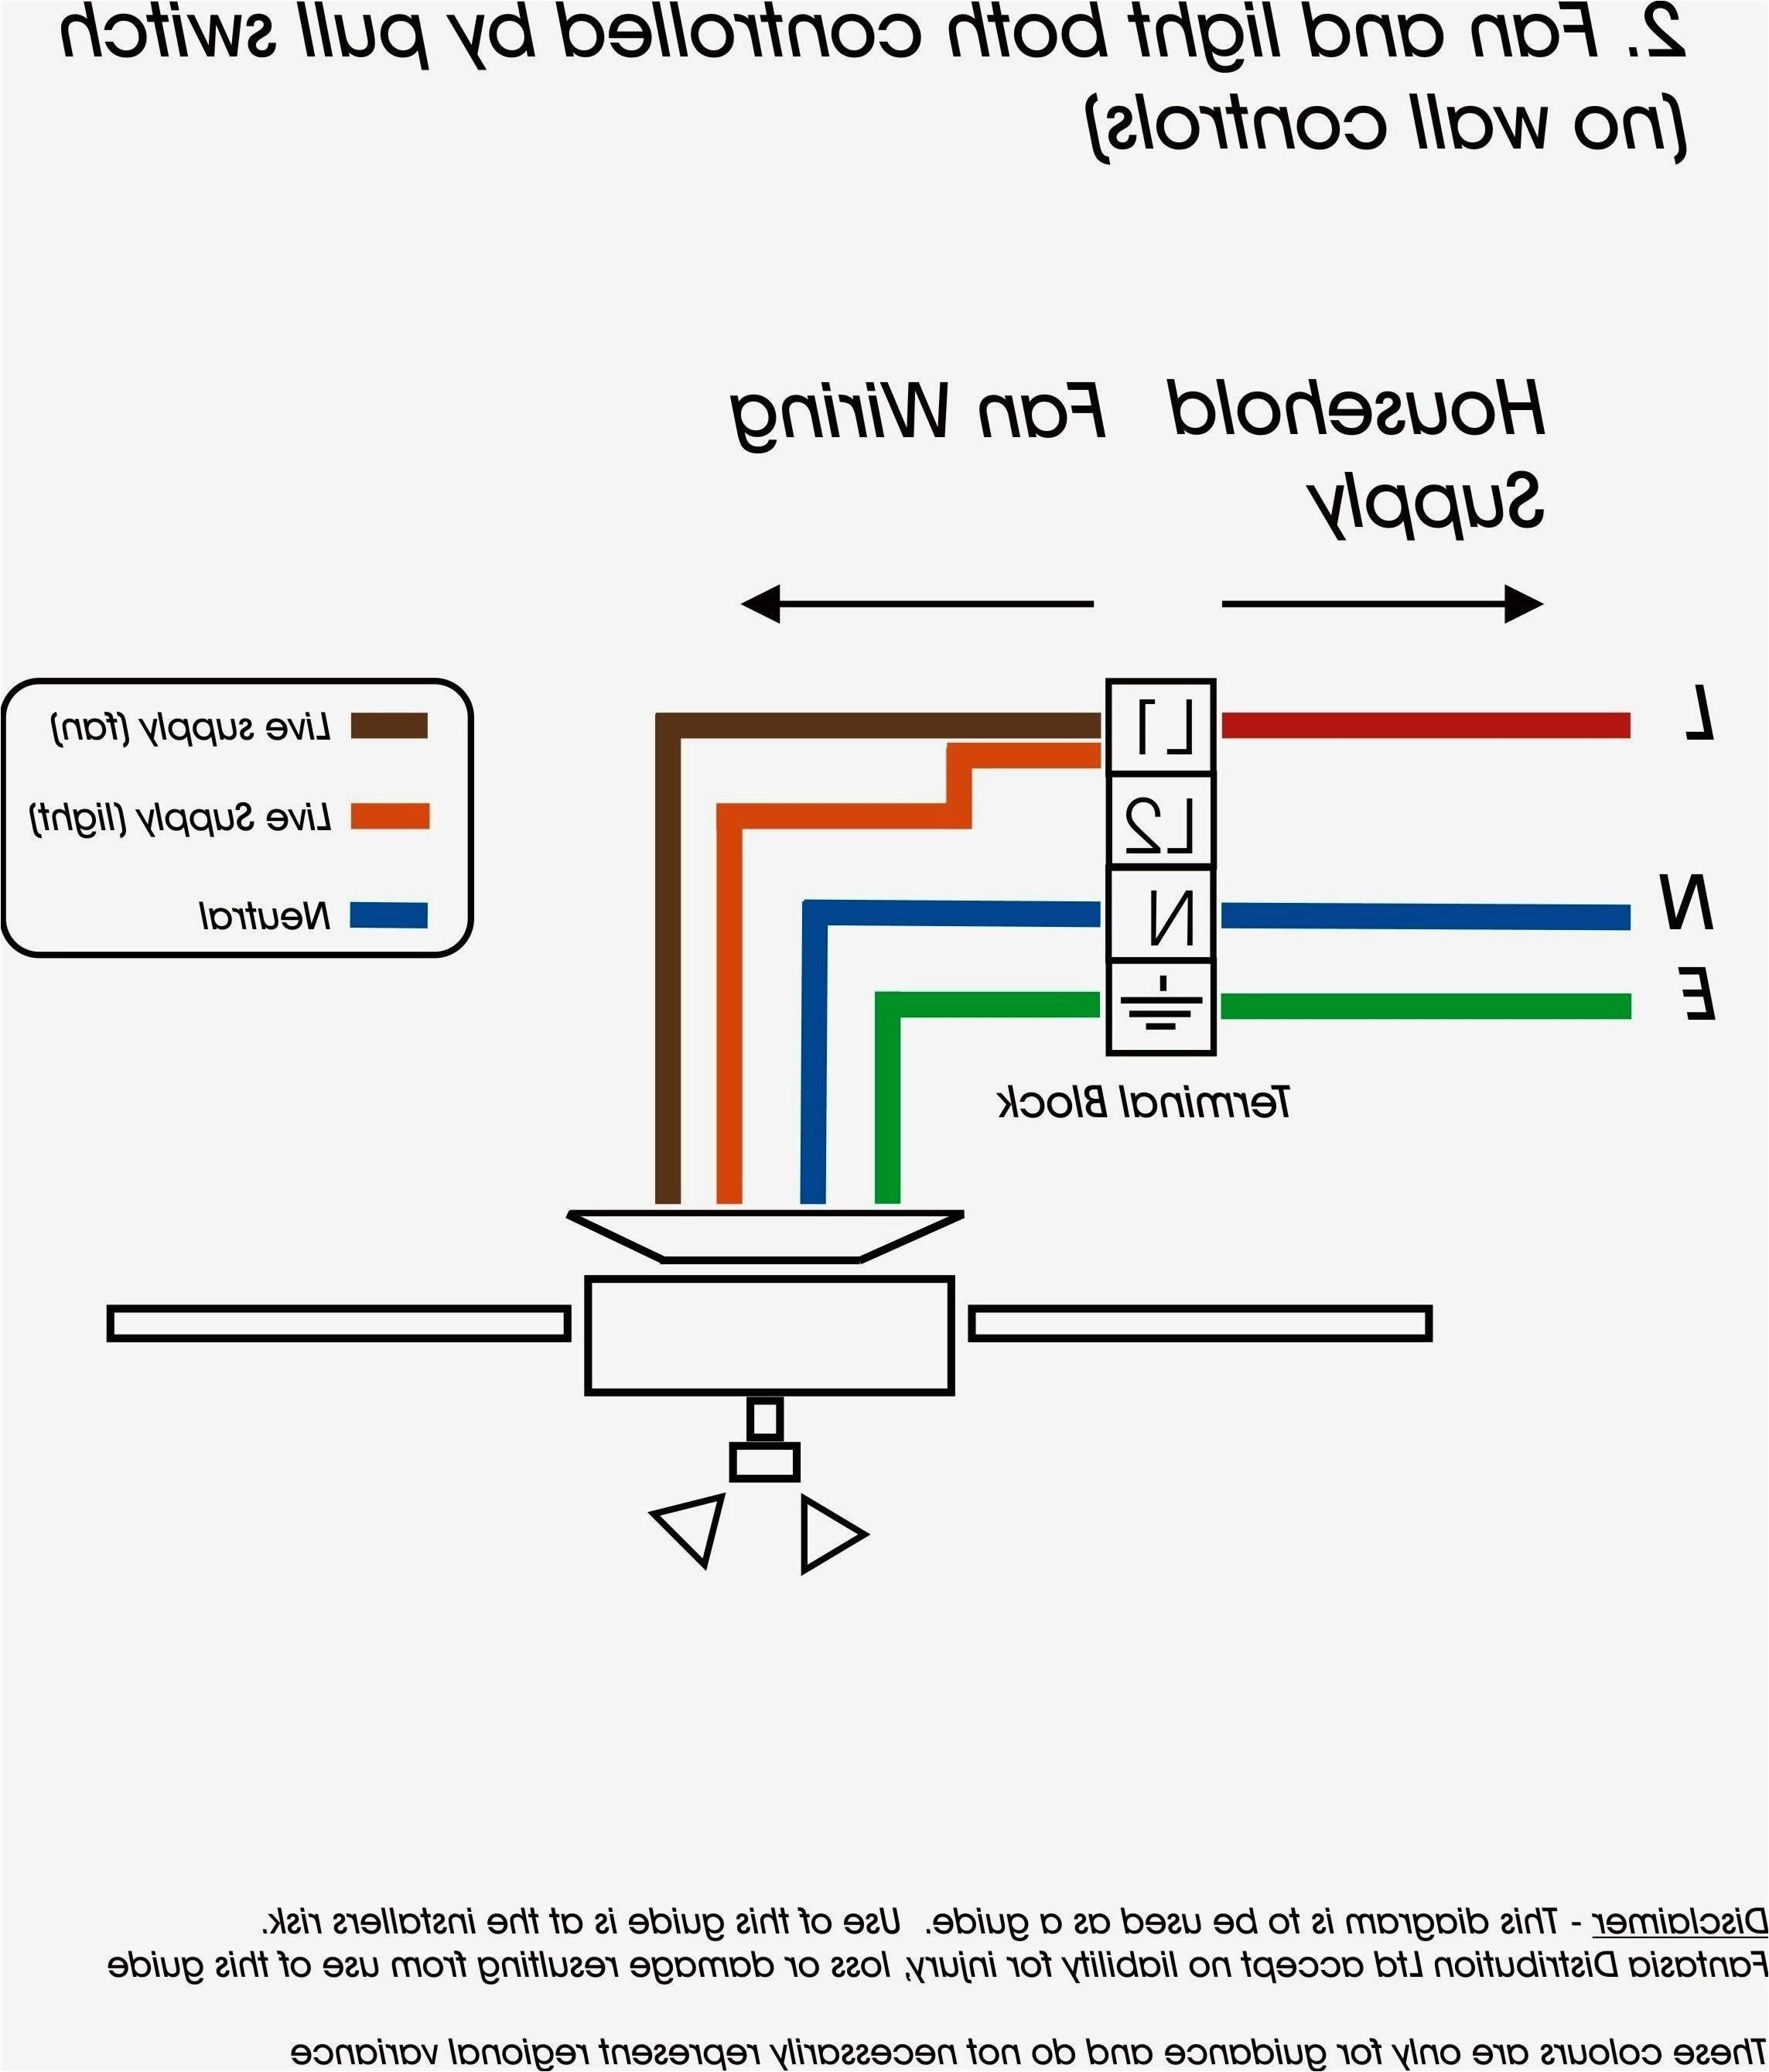 leviton 3 way wiring diagram fresh leviton three way dimmer switch wiring diagram 2018 wiring diagram